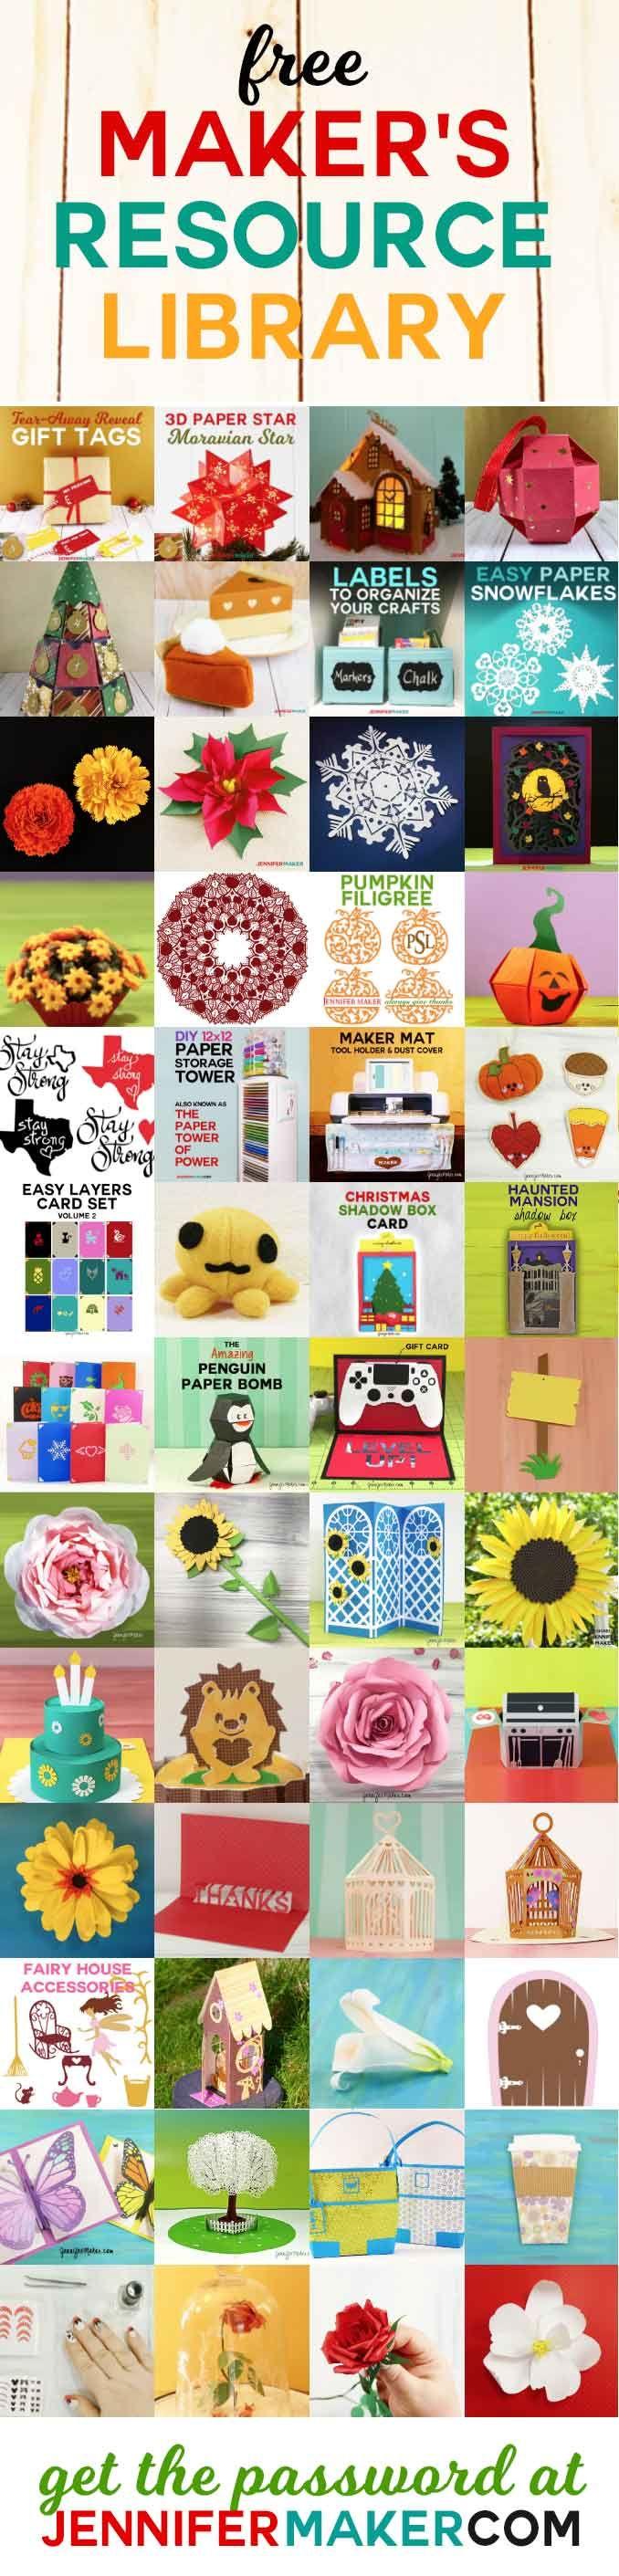 JenniferMaker DIY & Craft File Resource Library Cricut